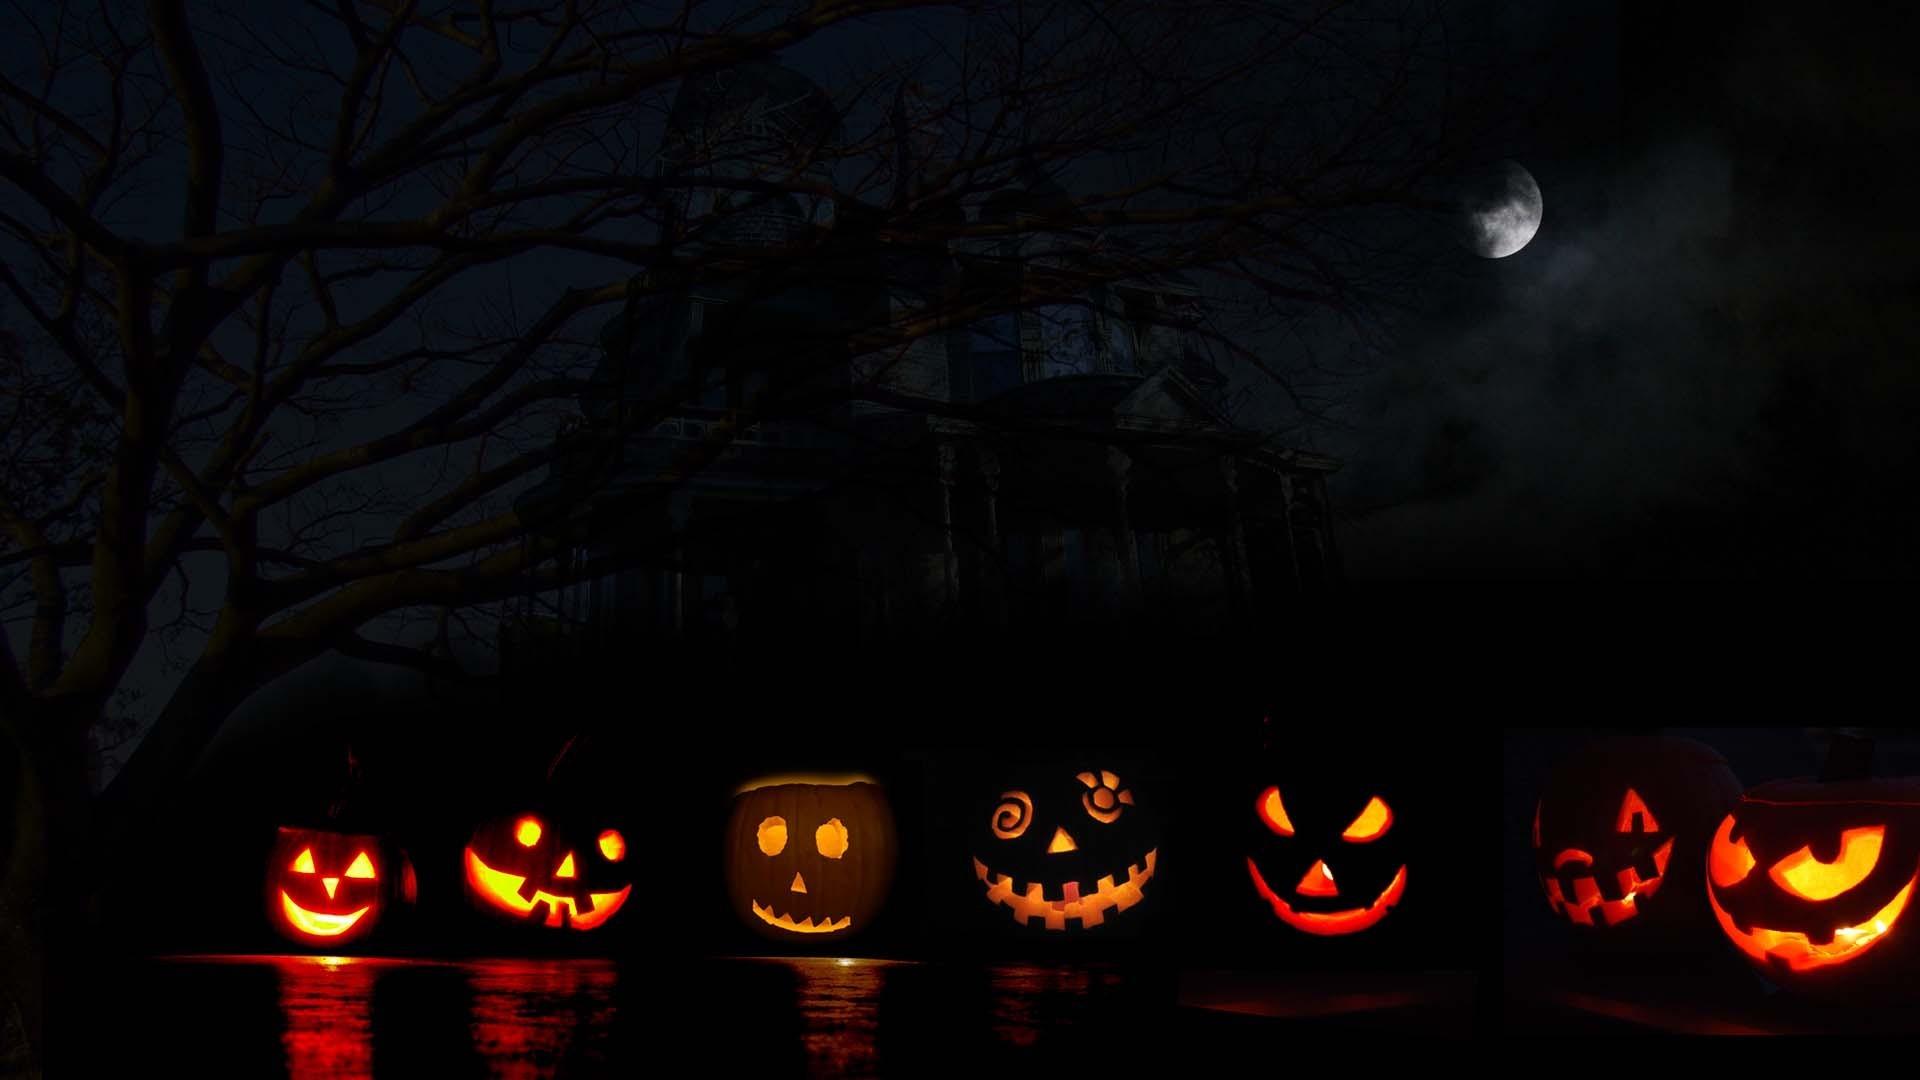 Popular Wallpaper Halloween Windows 10 - 269323-gorgerous-halloween-background-1920x1080-windows-10  Collection_59516.jpg